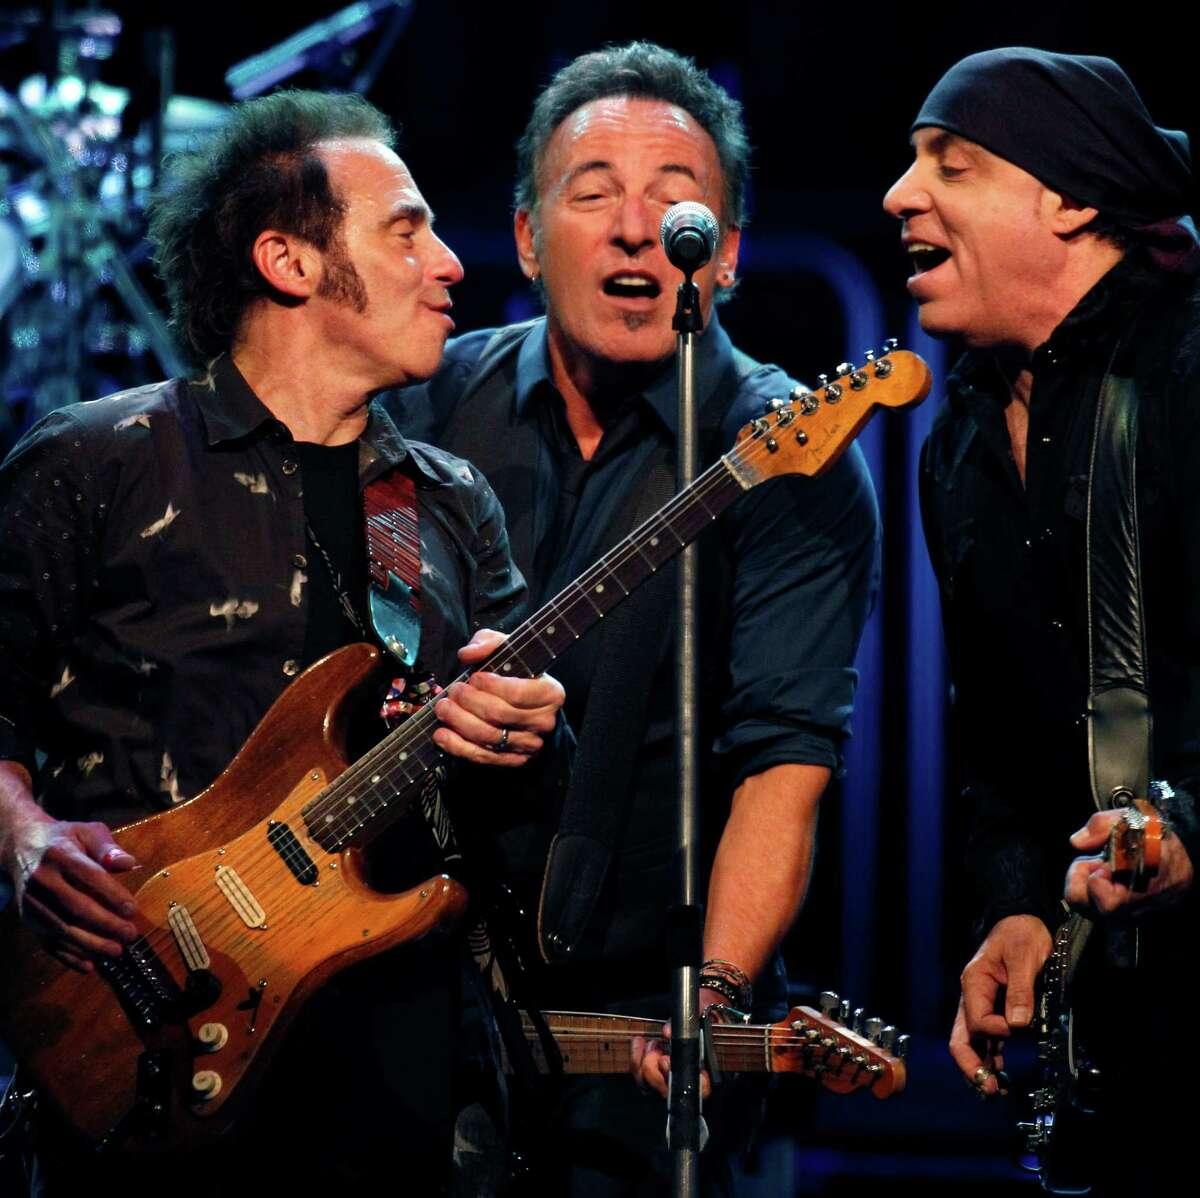 Nils Lofgren, left, Bruce Springsteen, center, and Steven Van Zandt perform with the E Street Band during the Wrecking Ball tour at the Wells Fargo Center Wednesday, March 28, 2012 in Philadelphia. (AP Photo/Alex Brandon)